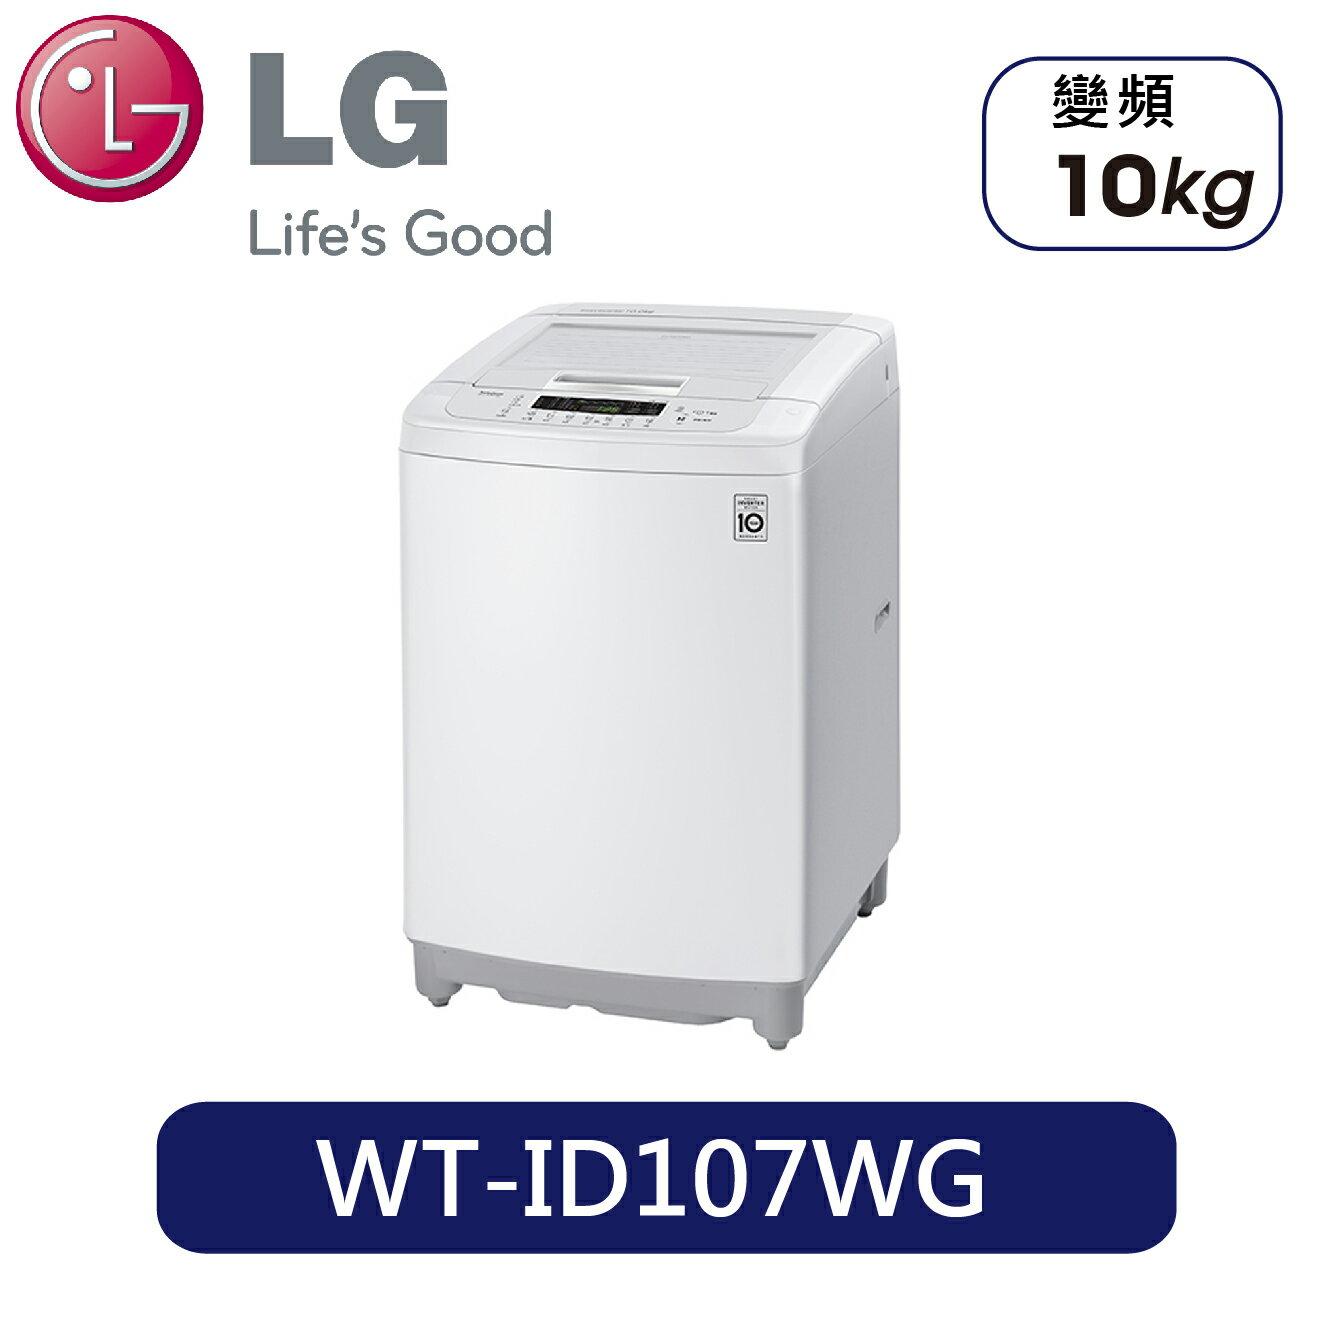 LG | 10KG 智慧變頻 直立式洗衣機 WT~ID107WG